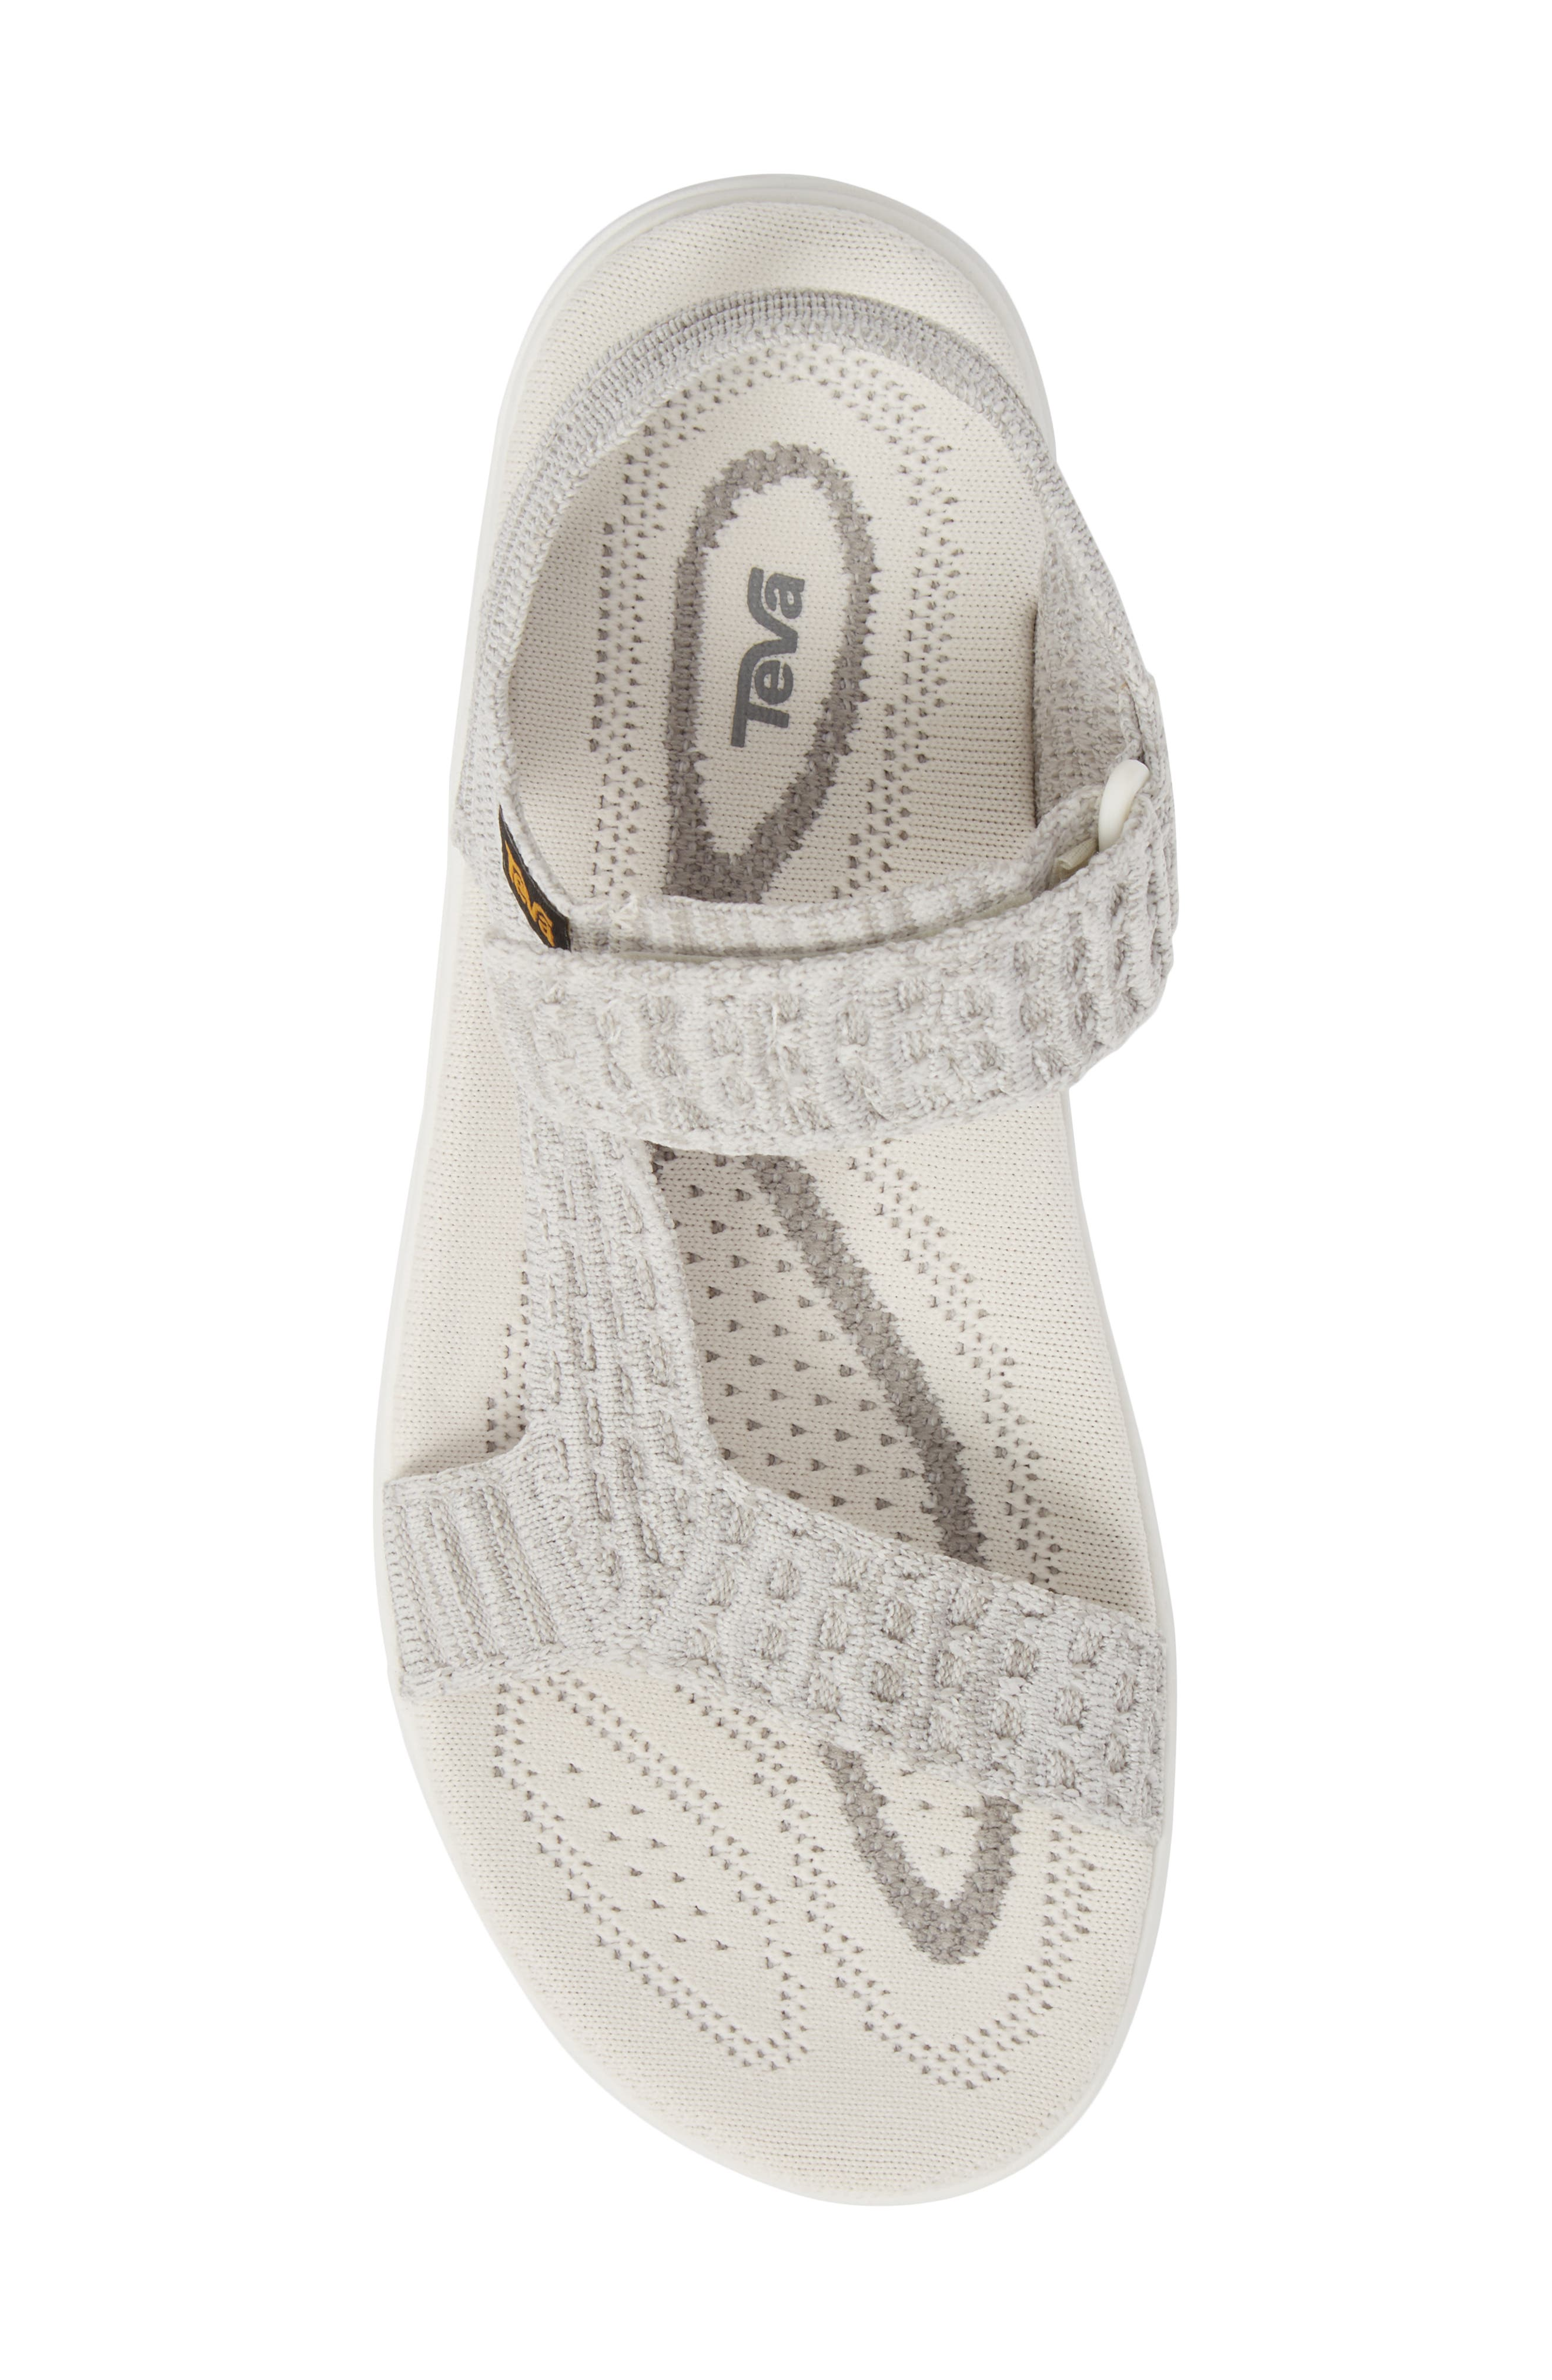 Terra Float 2 Knit Universal Sandal,                             Alternate thumbnail 5, color,                             Bright White Fabric